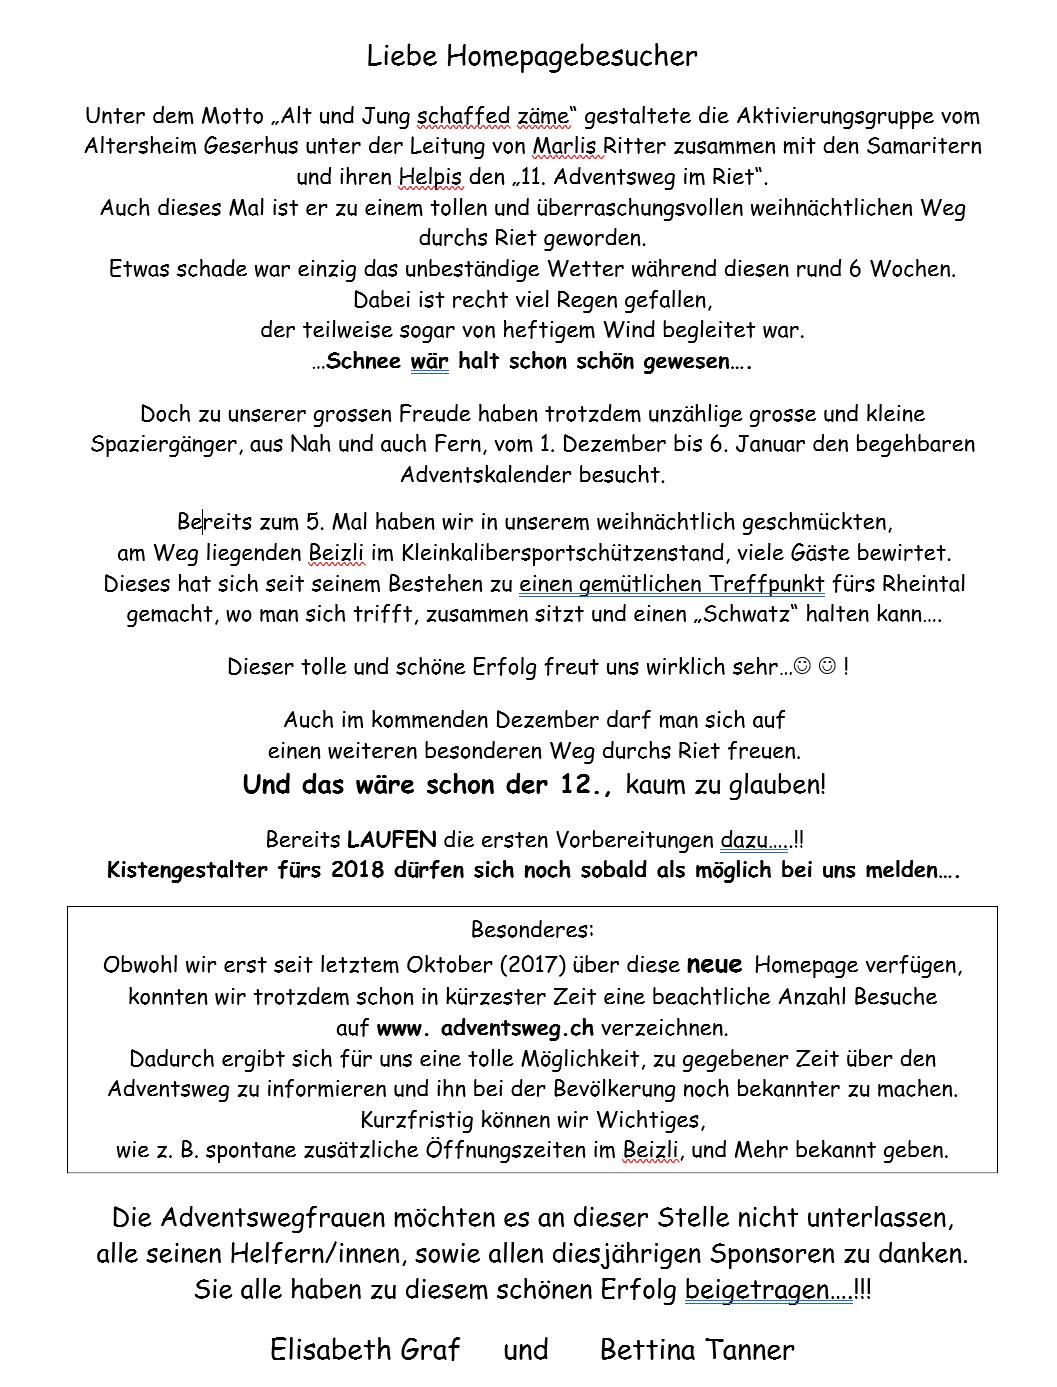 2017-Abschlussbericht fr Homepagepng